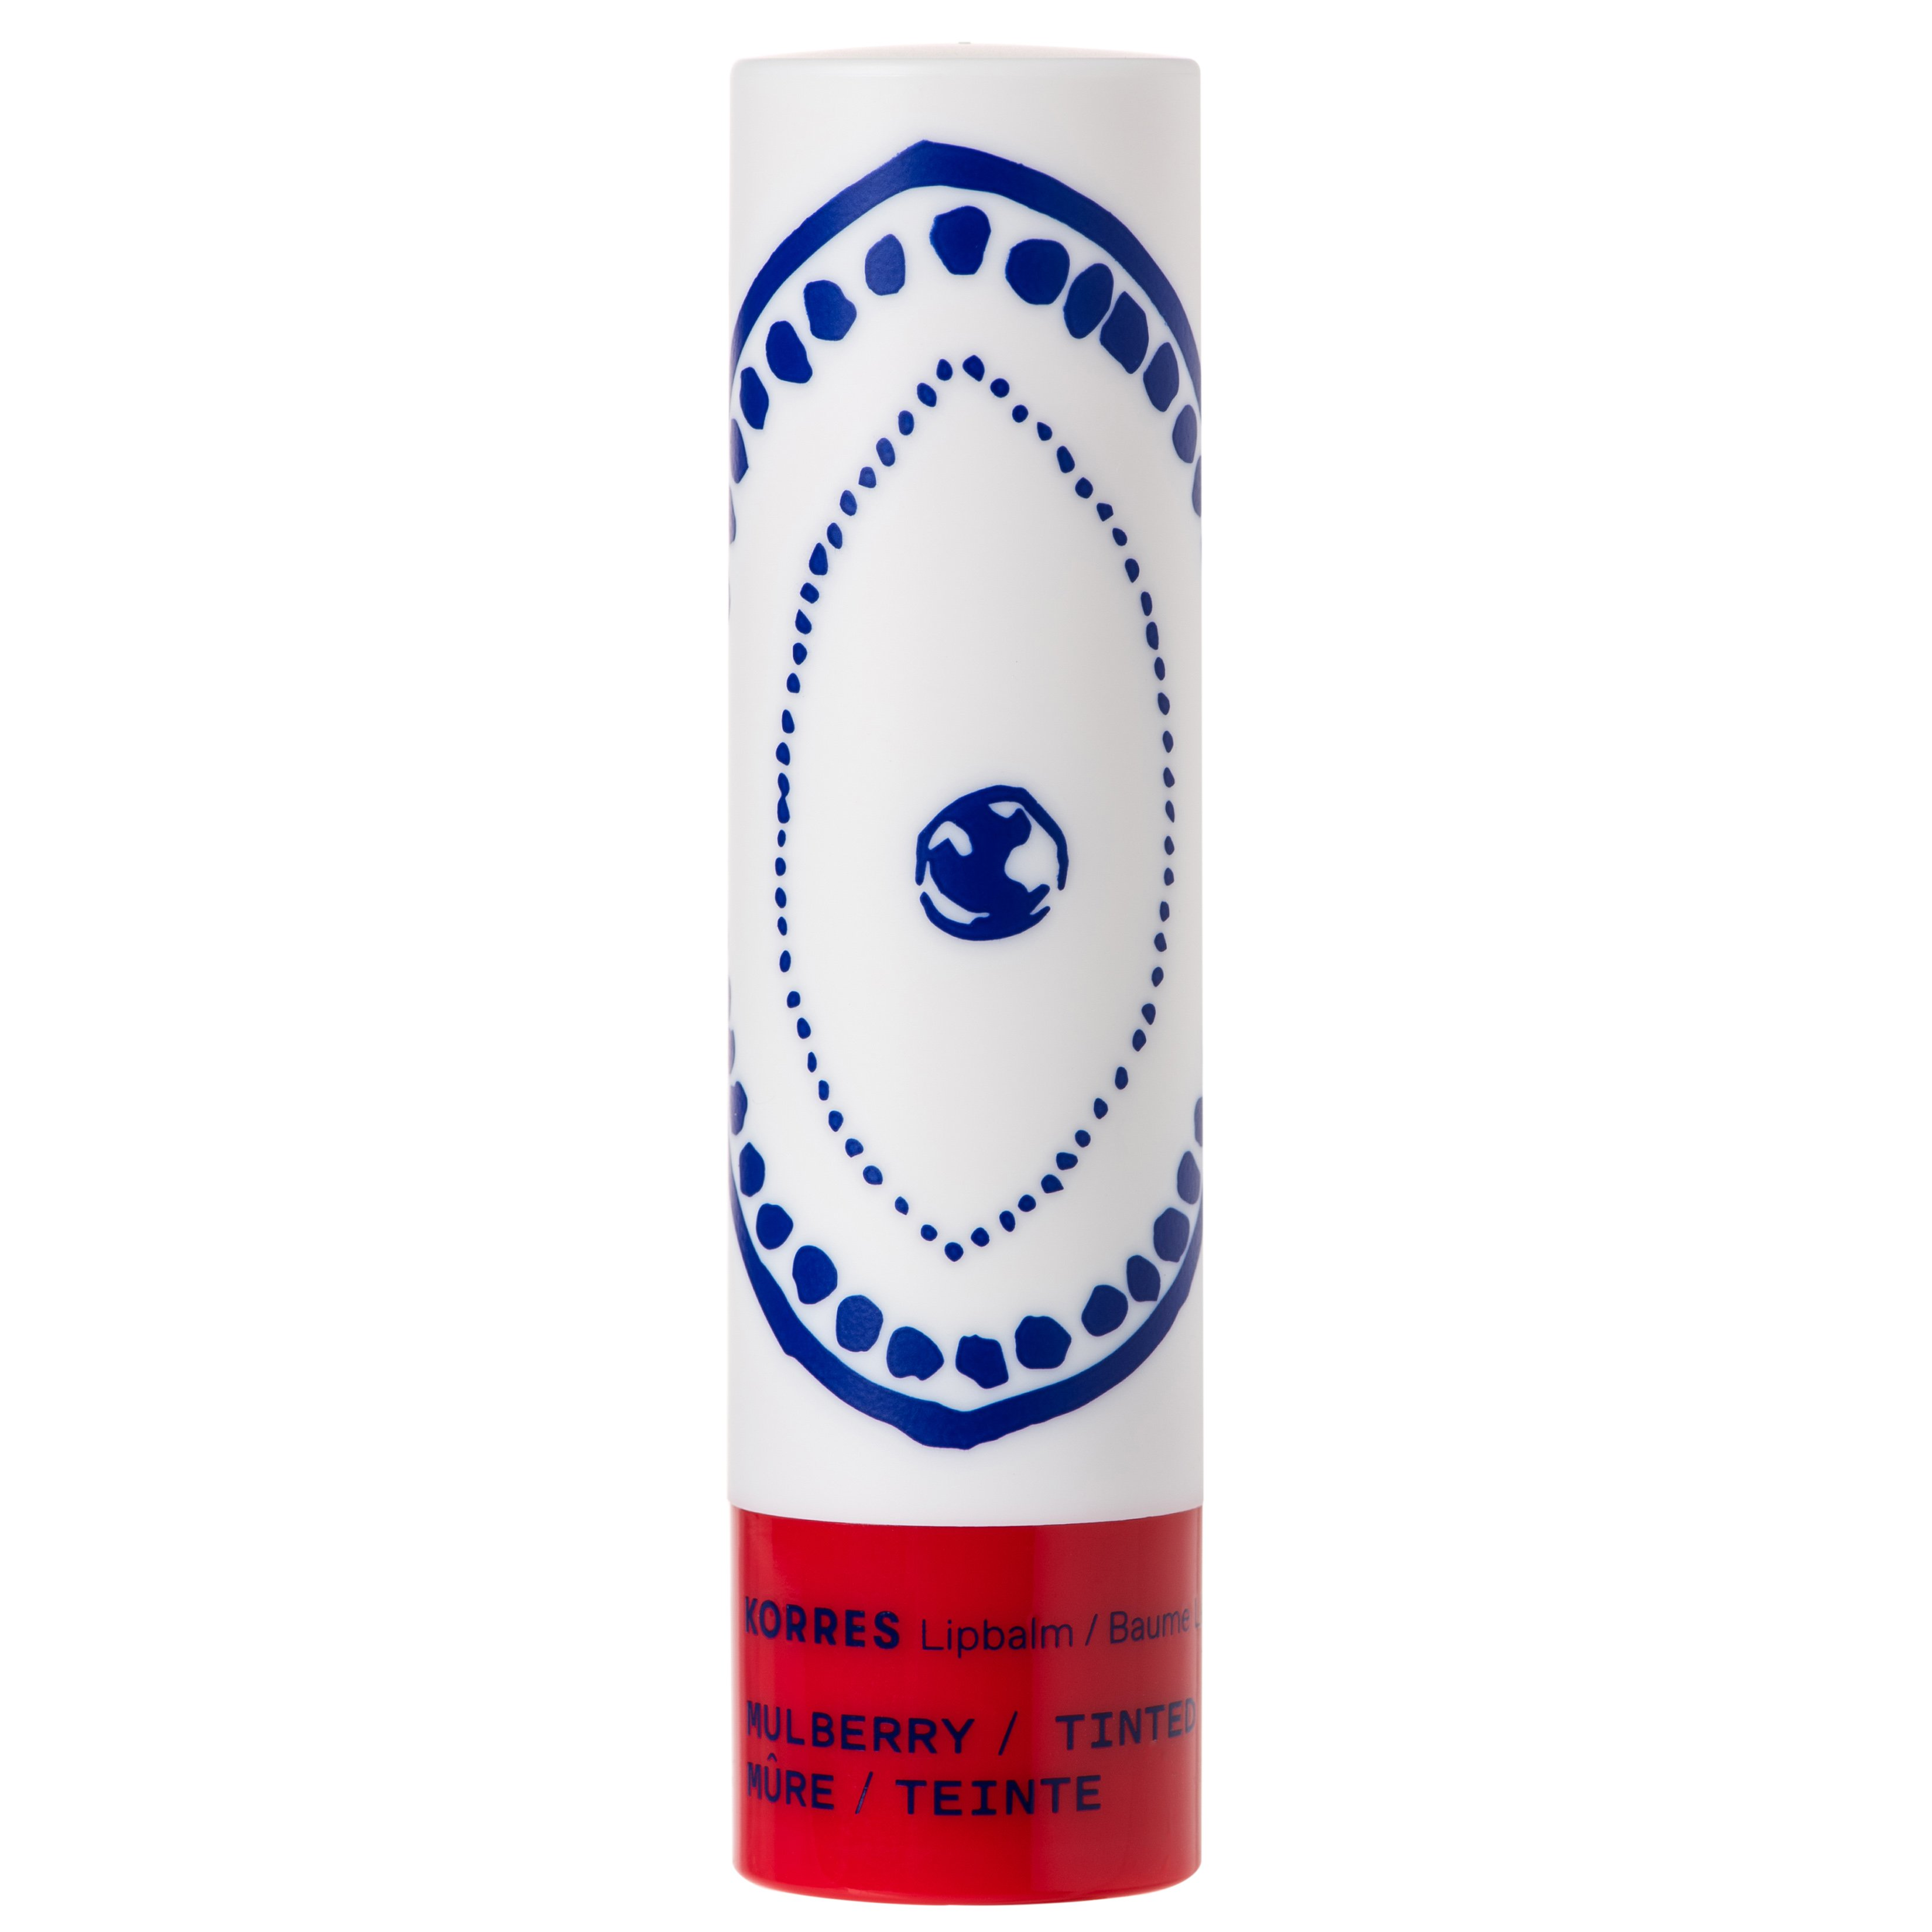 Korres Lip Balm Mulberry Tinded Εντατική Ενυδατική Φροντίδα για τα Χείλη με Ζουμερό Χρώμα από Κόκκινα Μούρα 4.5g